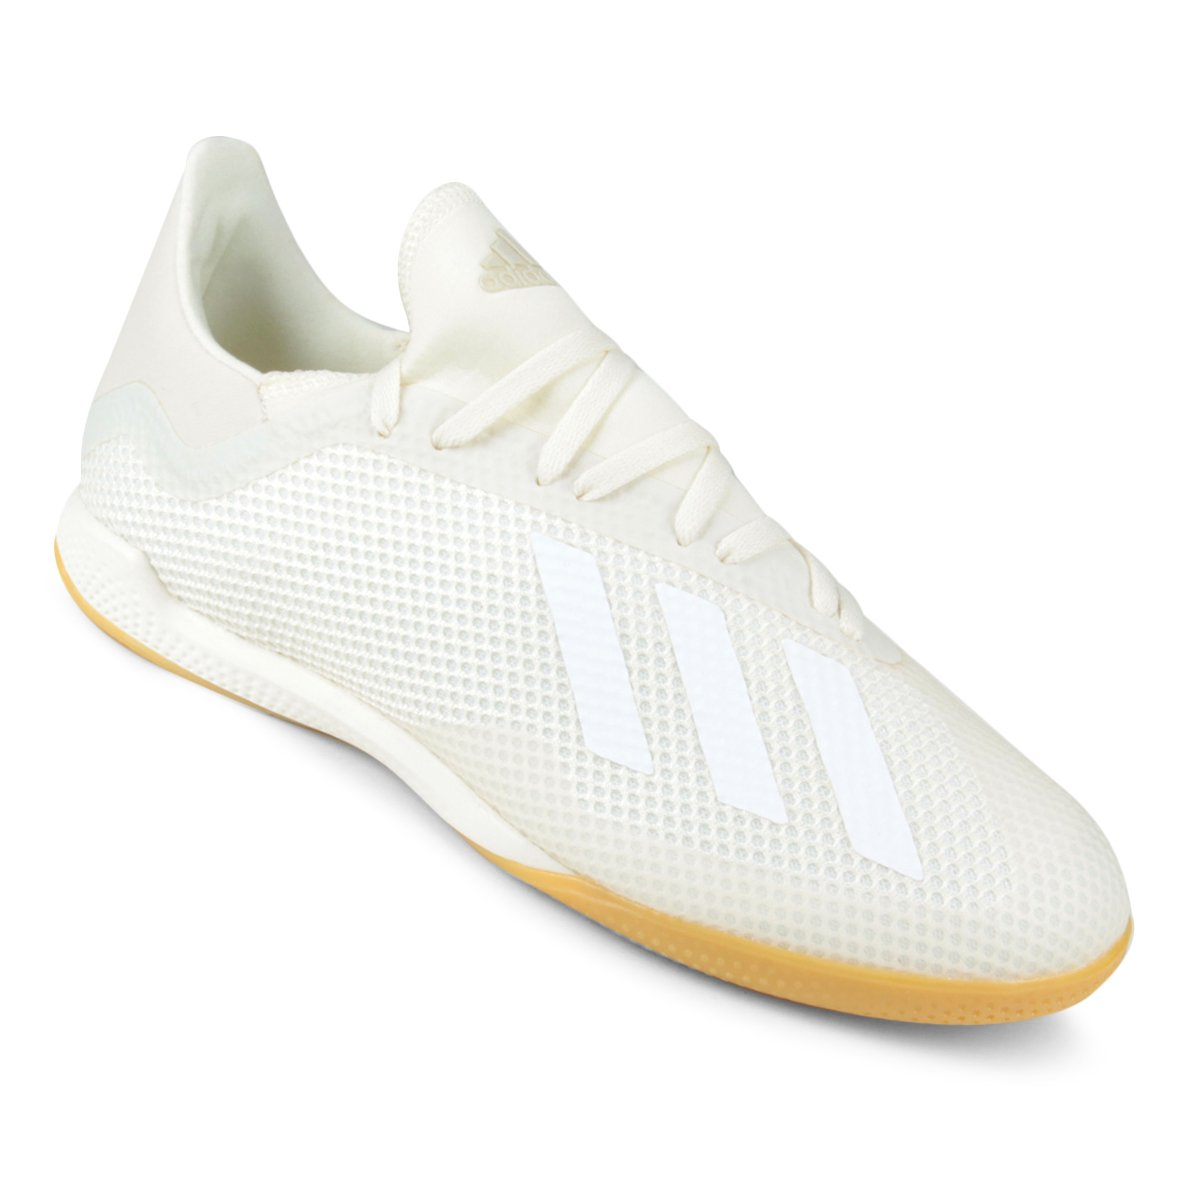 Chuteira Futsal Adidas X Tango 18 3 IN - Branco - Compre Agora ... ce97b8957fe85